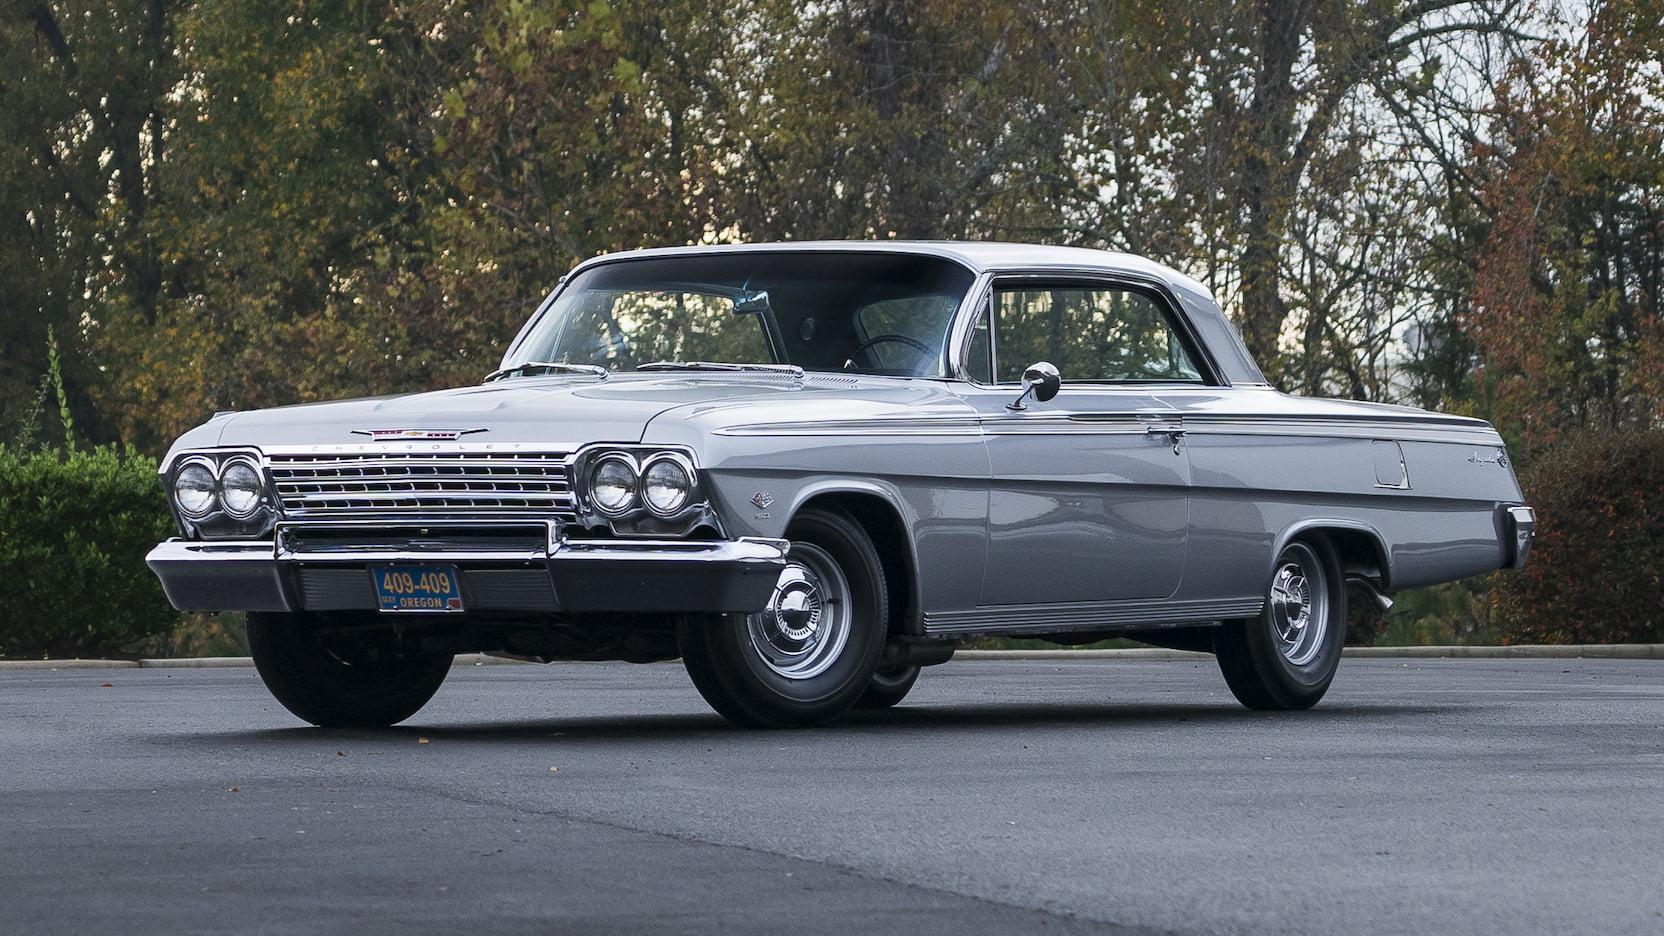 1962 Chevrolet Impala SS front 3/4